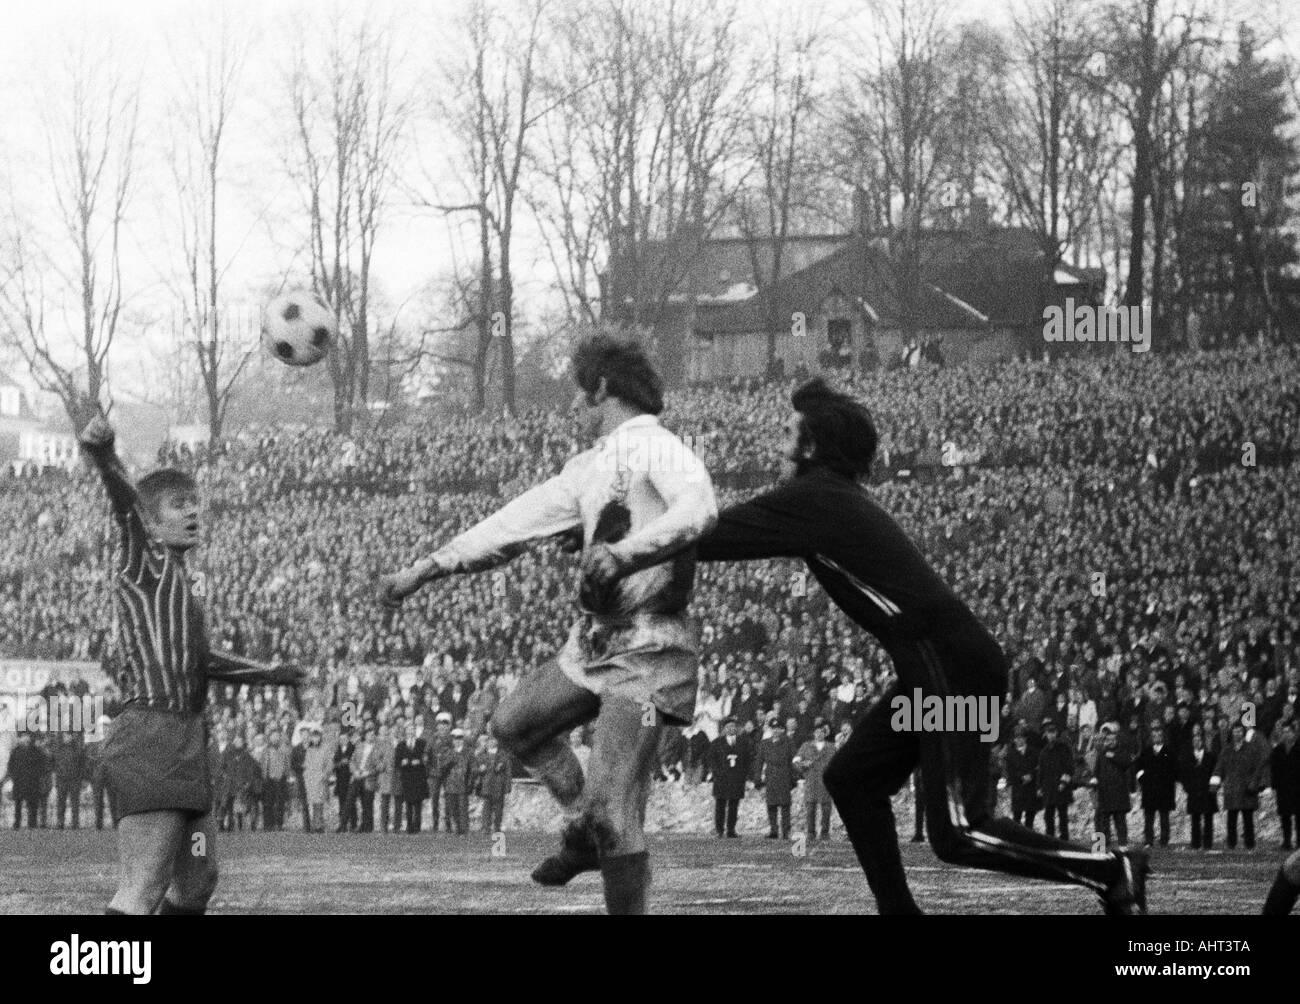 football, Regionalliga West, 1970/1971, Stadium am Zoo in Wuppertal, Wuppertaler SV versus Fortuna Duesseldorf 1:1, scene of the match, f.l.t.r. Werner Lungwitz (Ddorf), Guenter Proepper (WSV), keeper Bernd Franke (Ddorf) - Stock Image